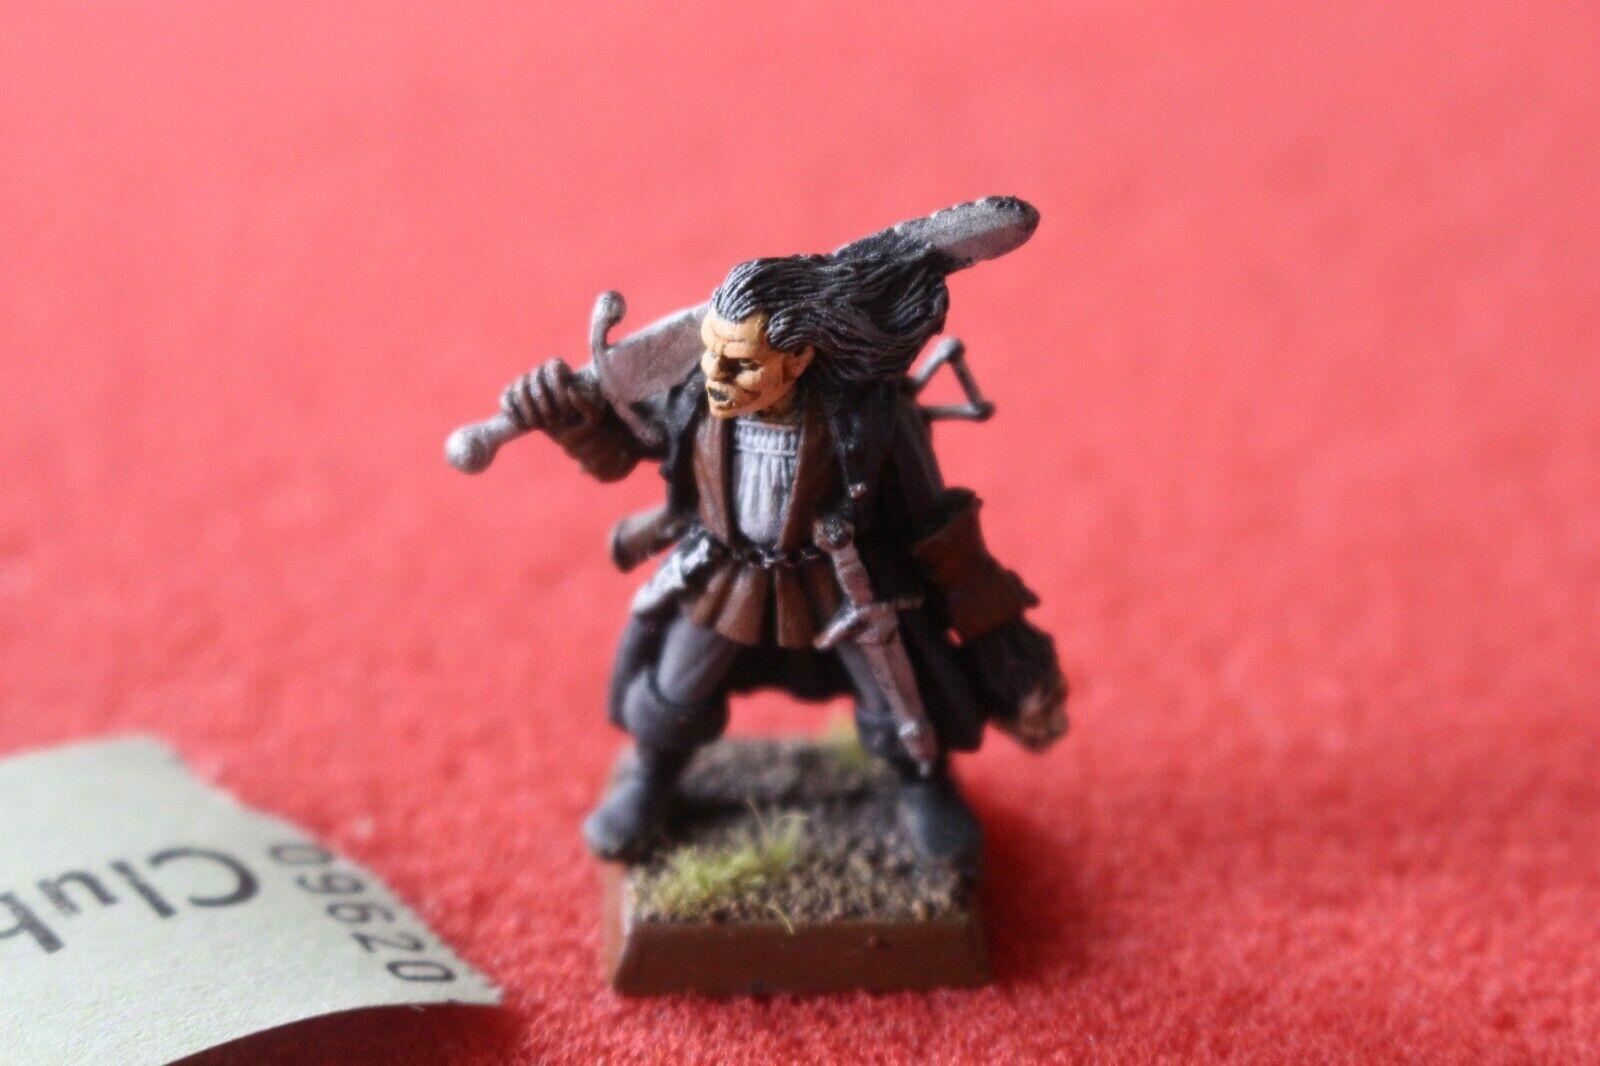 gran venta Juegos Workshop Mordheim Mordheim Witch Hunter Warhammer Metal Figura Painted Painted Painted C3  descuentos y mas